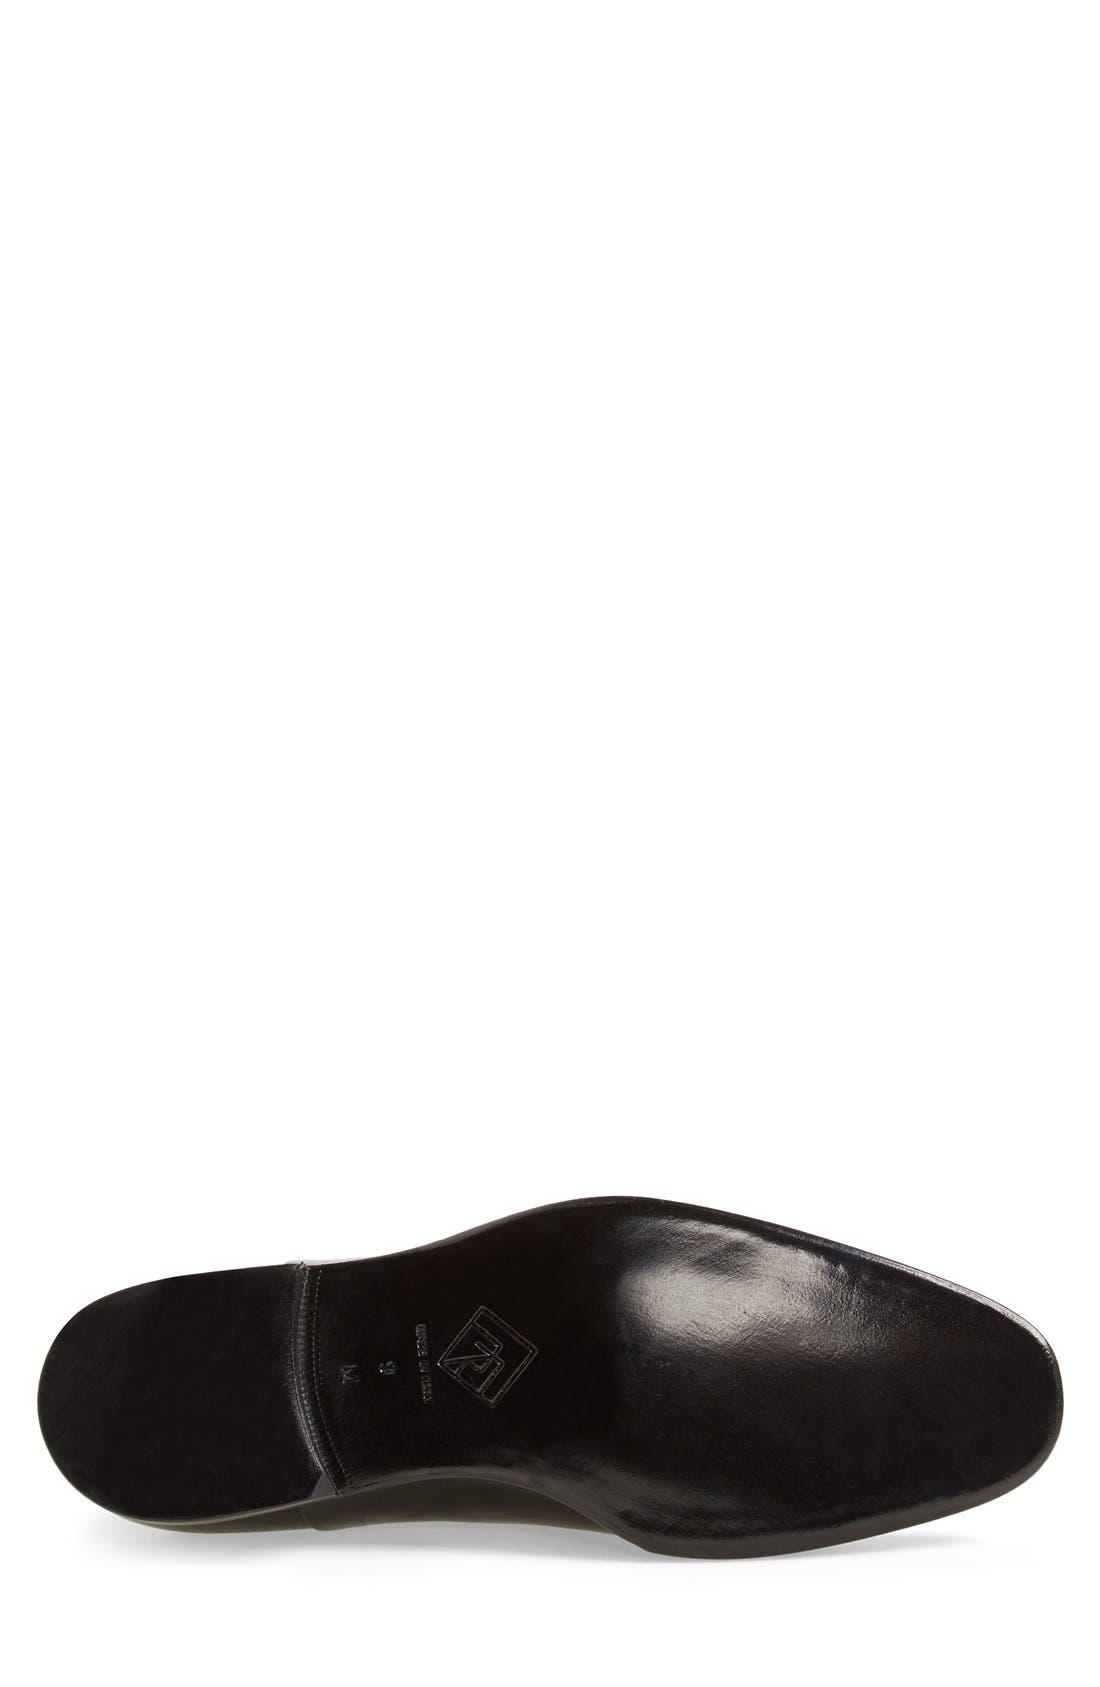 Lazio Cap-Toe Oxford,                             Alternate thumbnail 3, color,                             BLACK